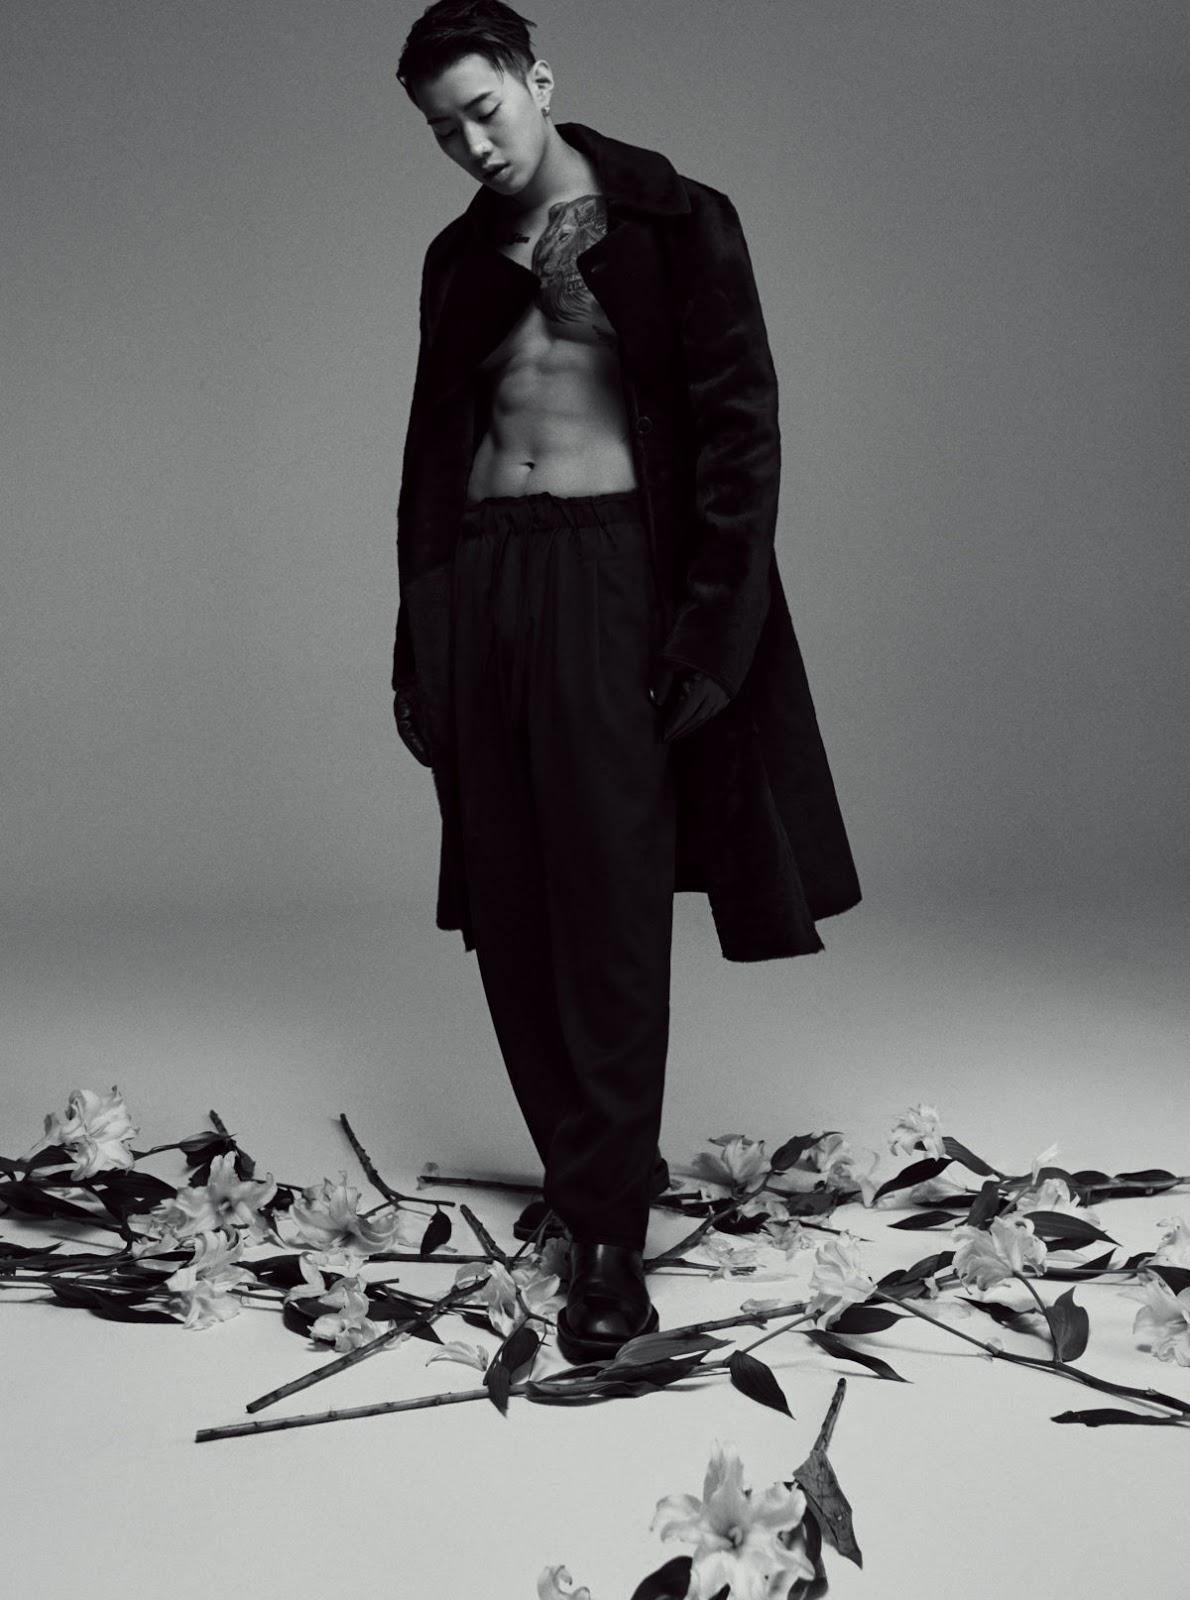 [Magazine] 2019.07.24 Jay Park @ GQ Korea